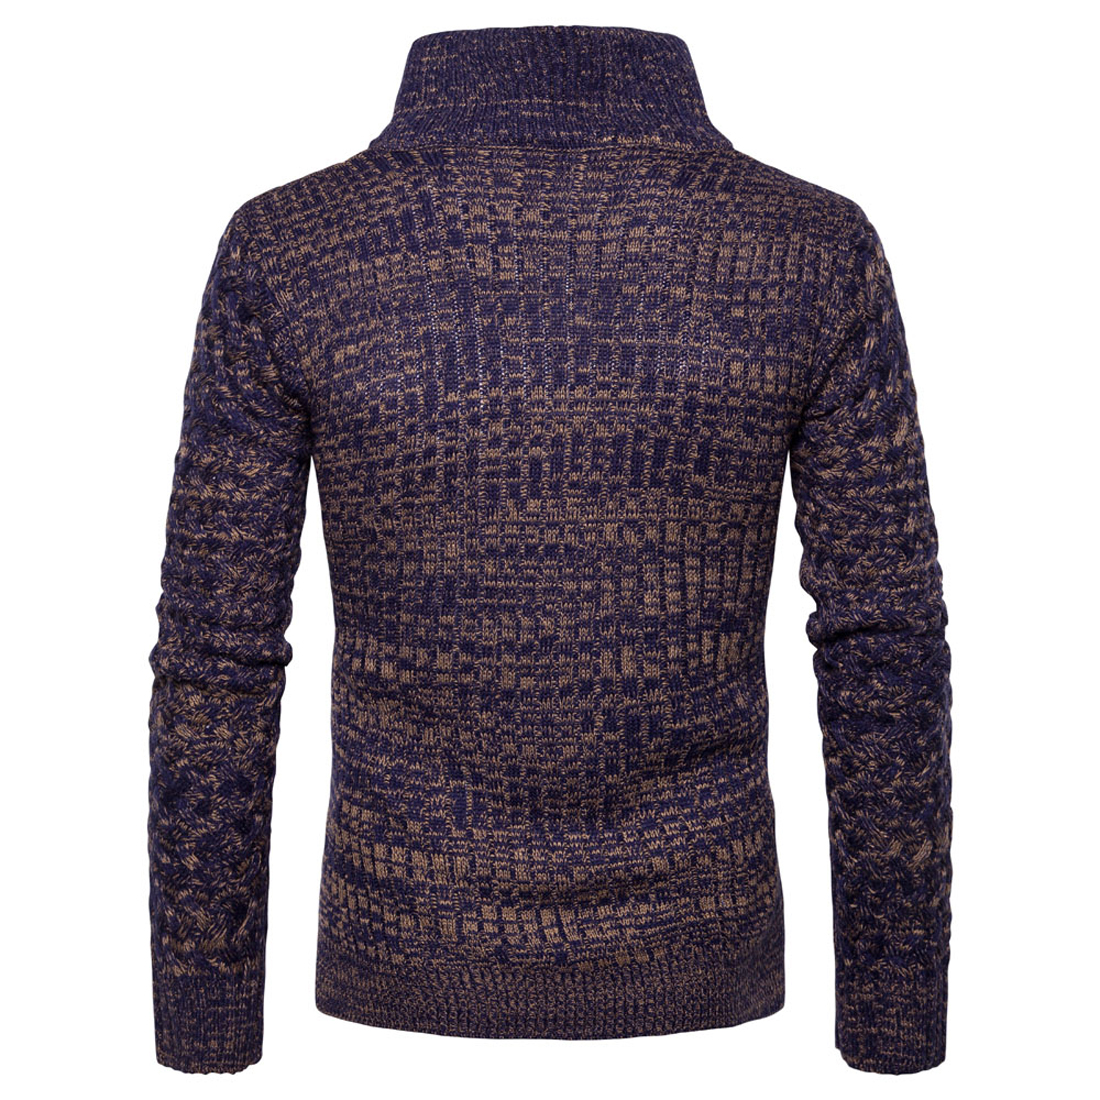 Brand Mens Sweater Zip Up Cardigan Turtleneck Knitted Winter Warm ...